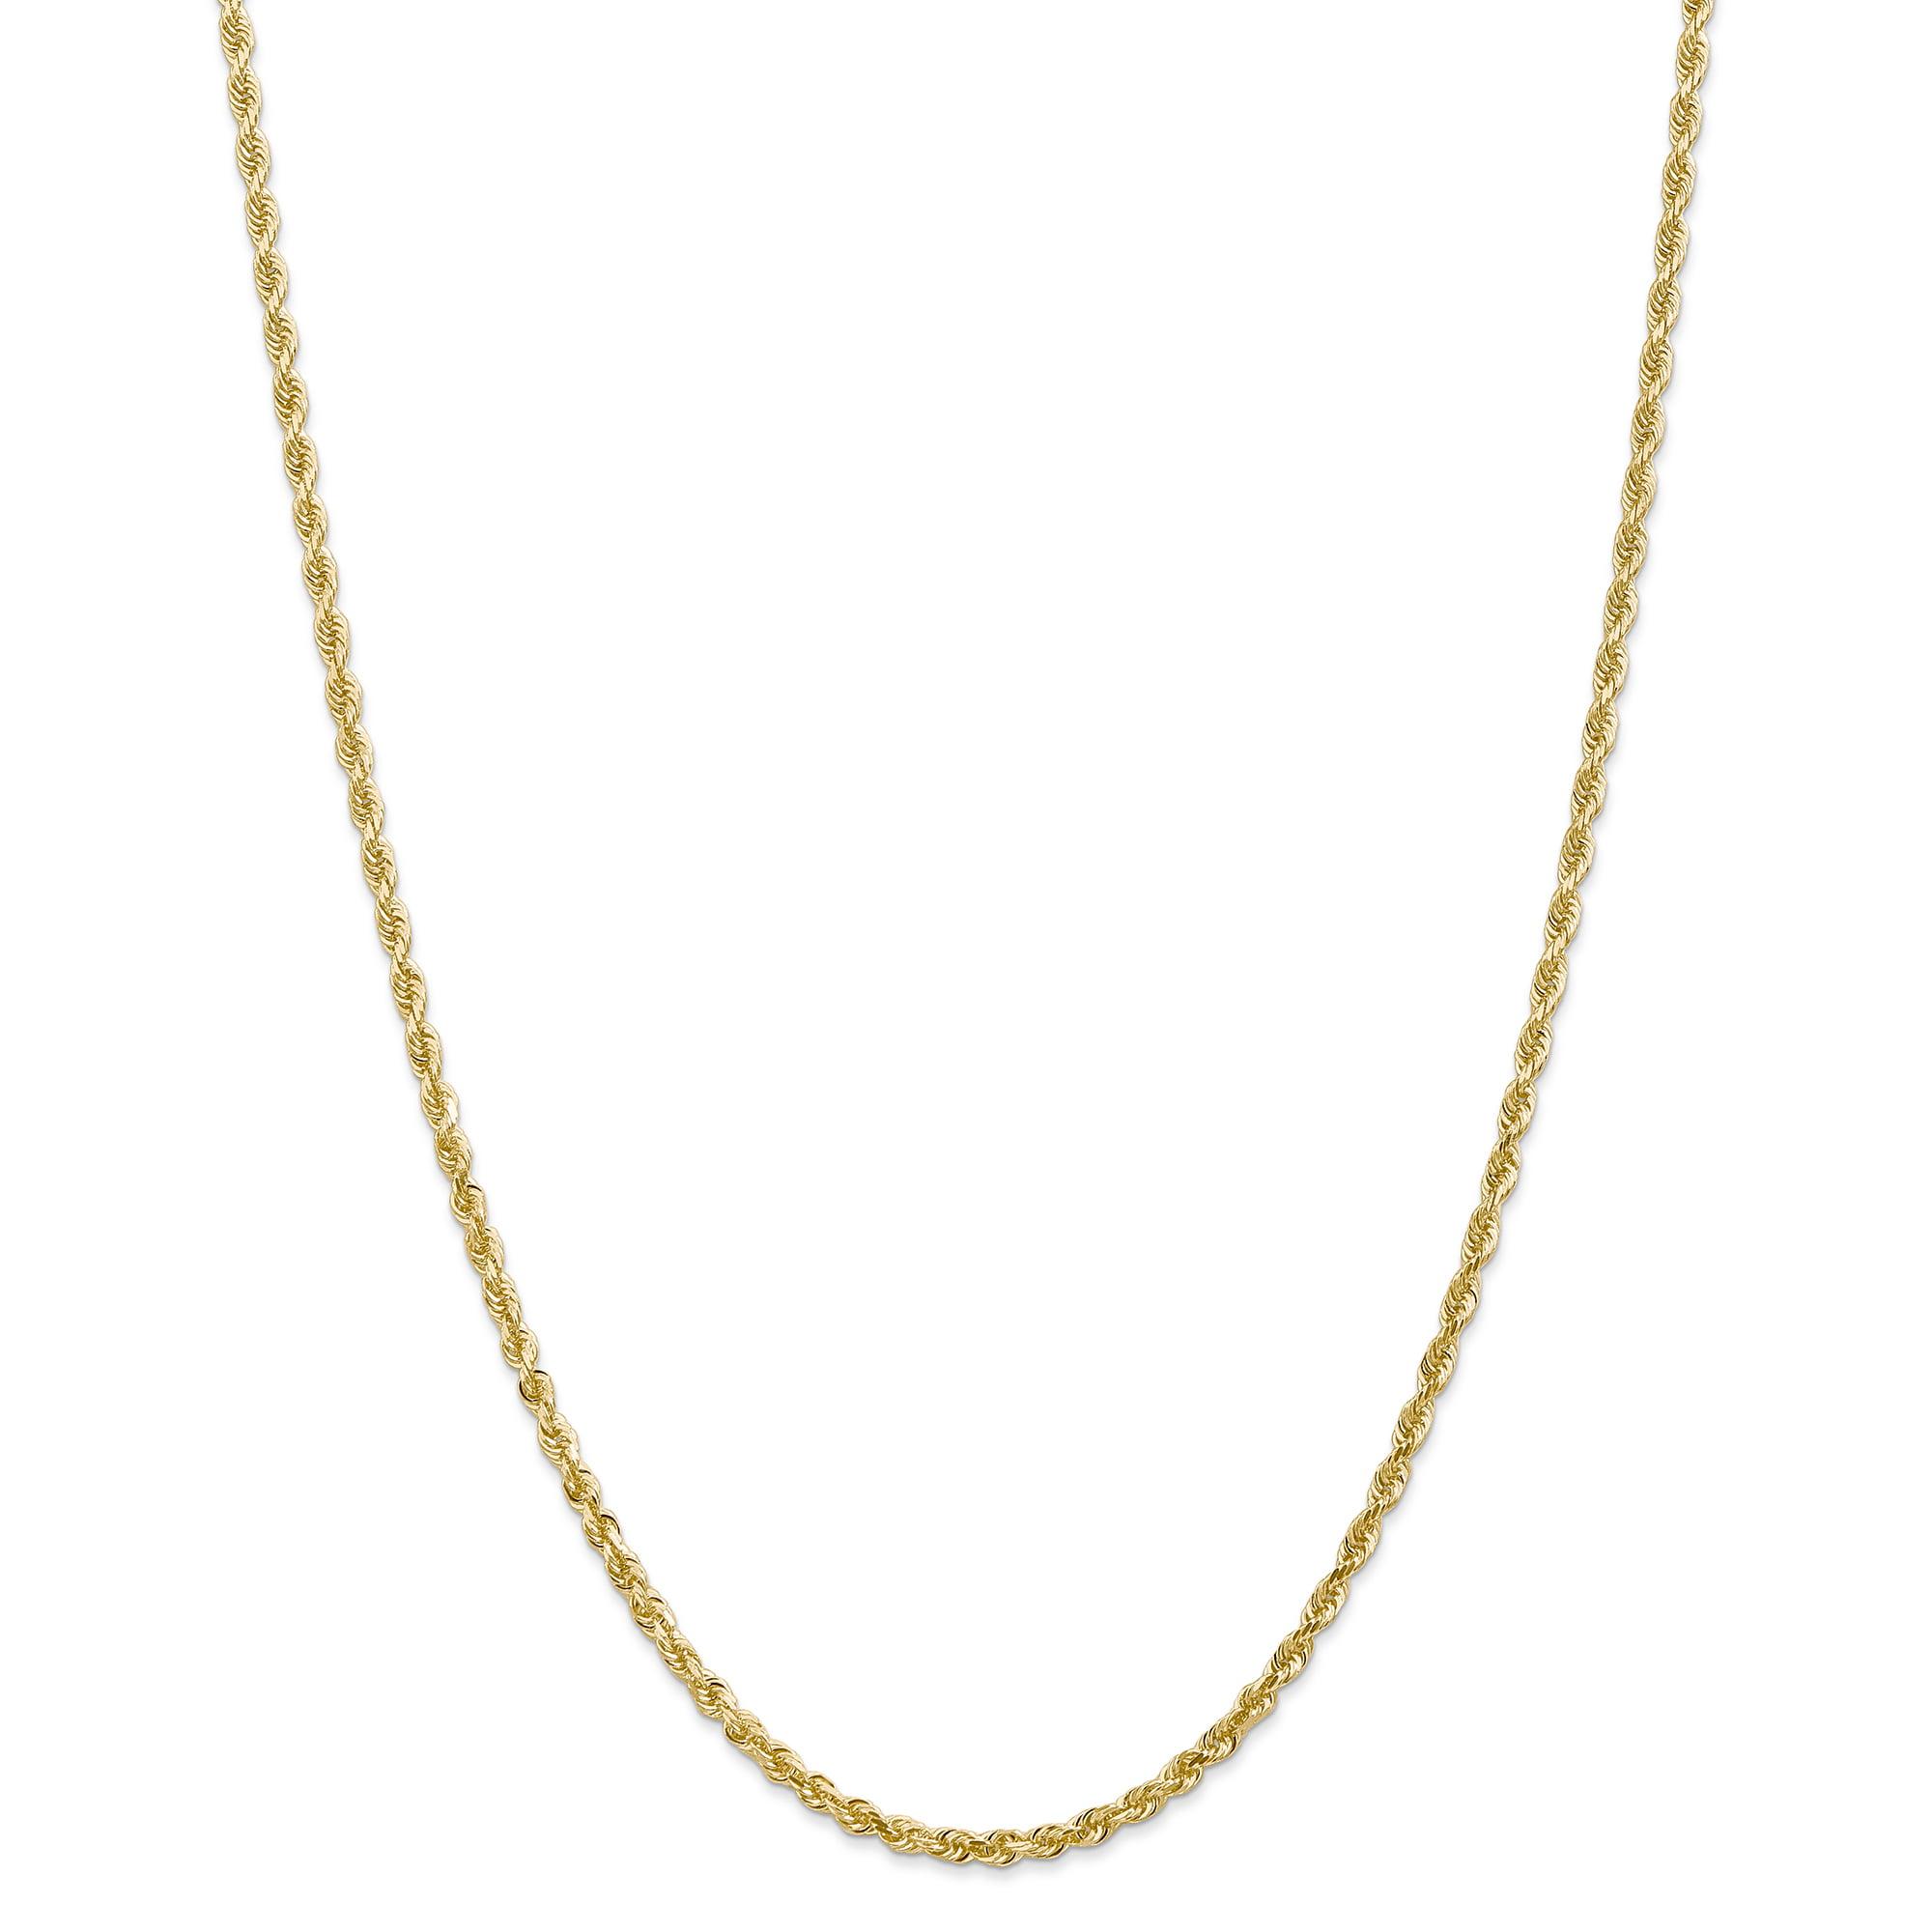 14K Yellow Gold 3.0mm Diamond Cut Quadruple Rope Chain 24 Inch - image 5 of 5